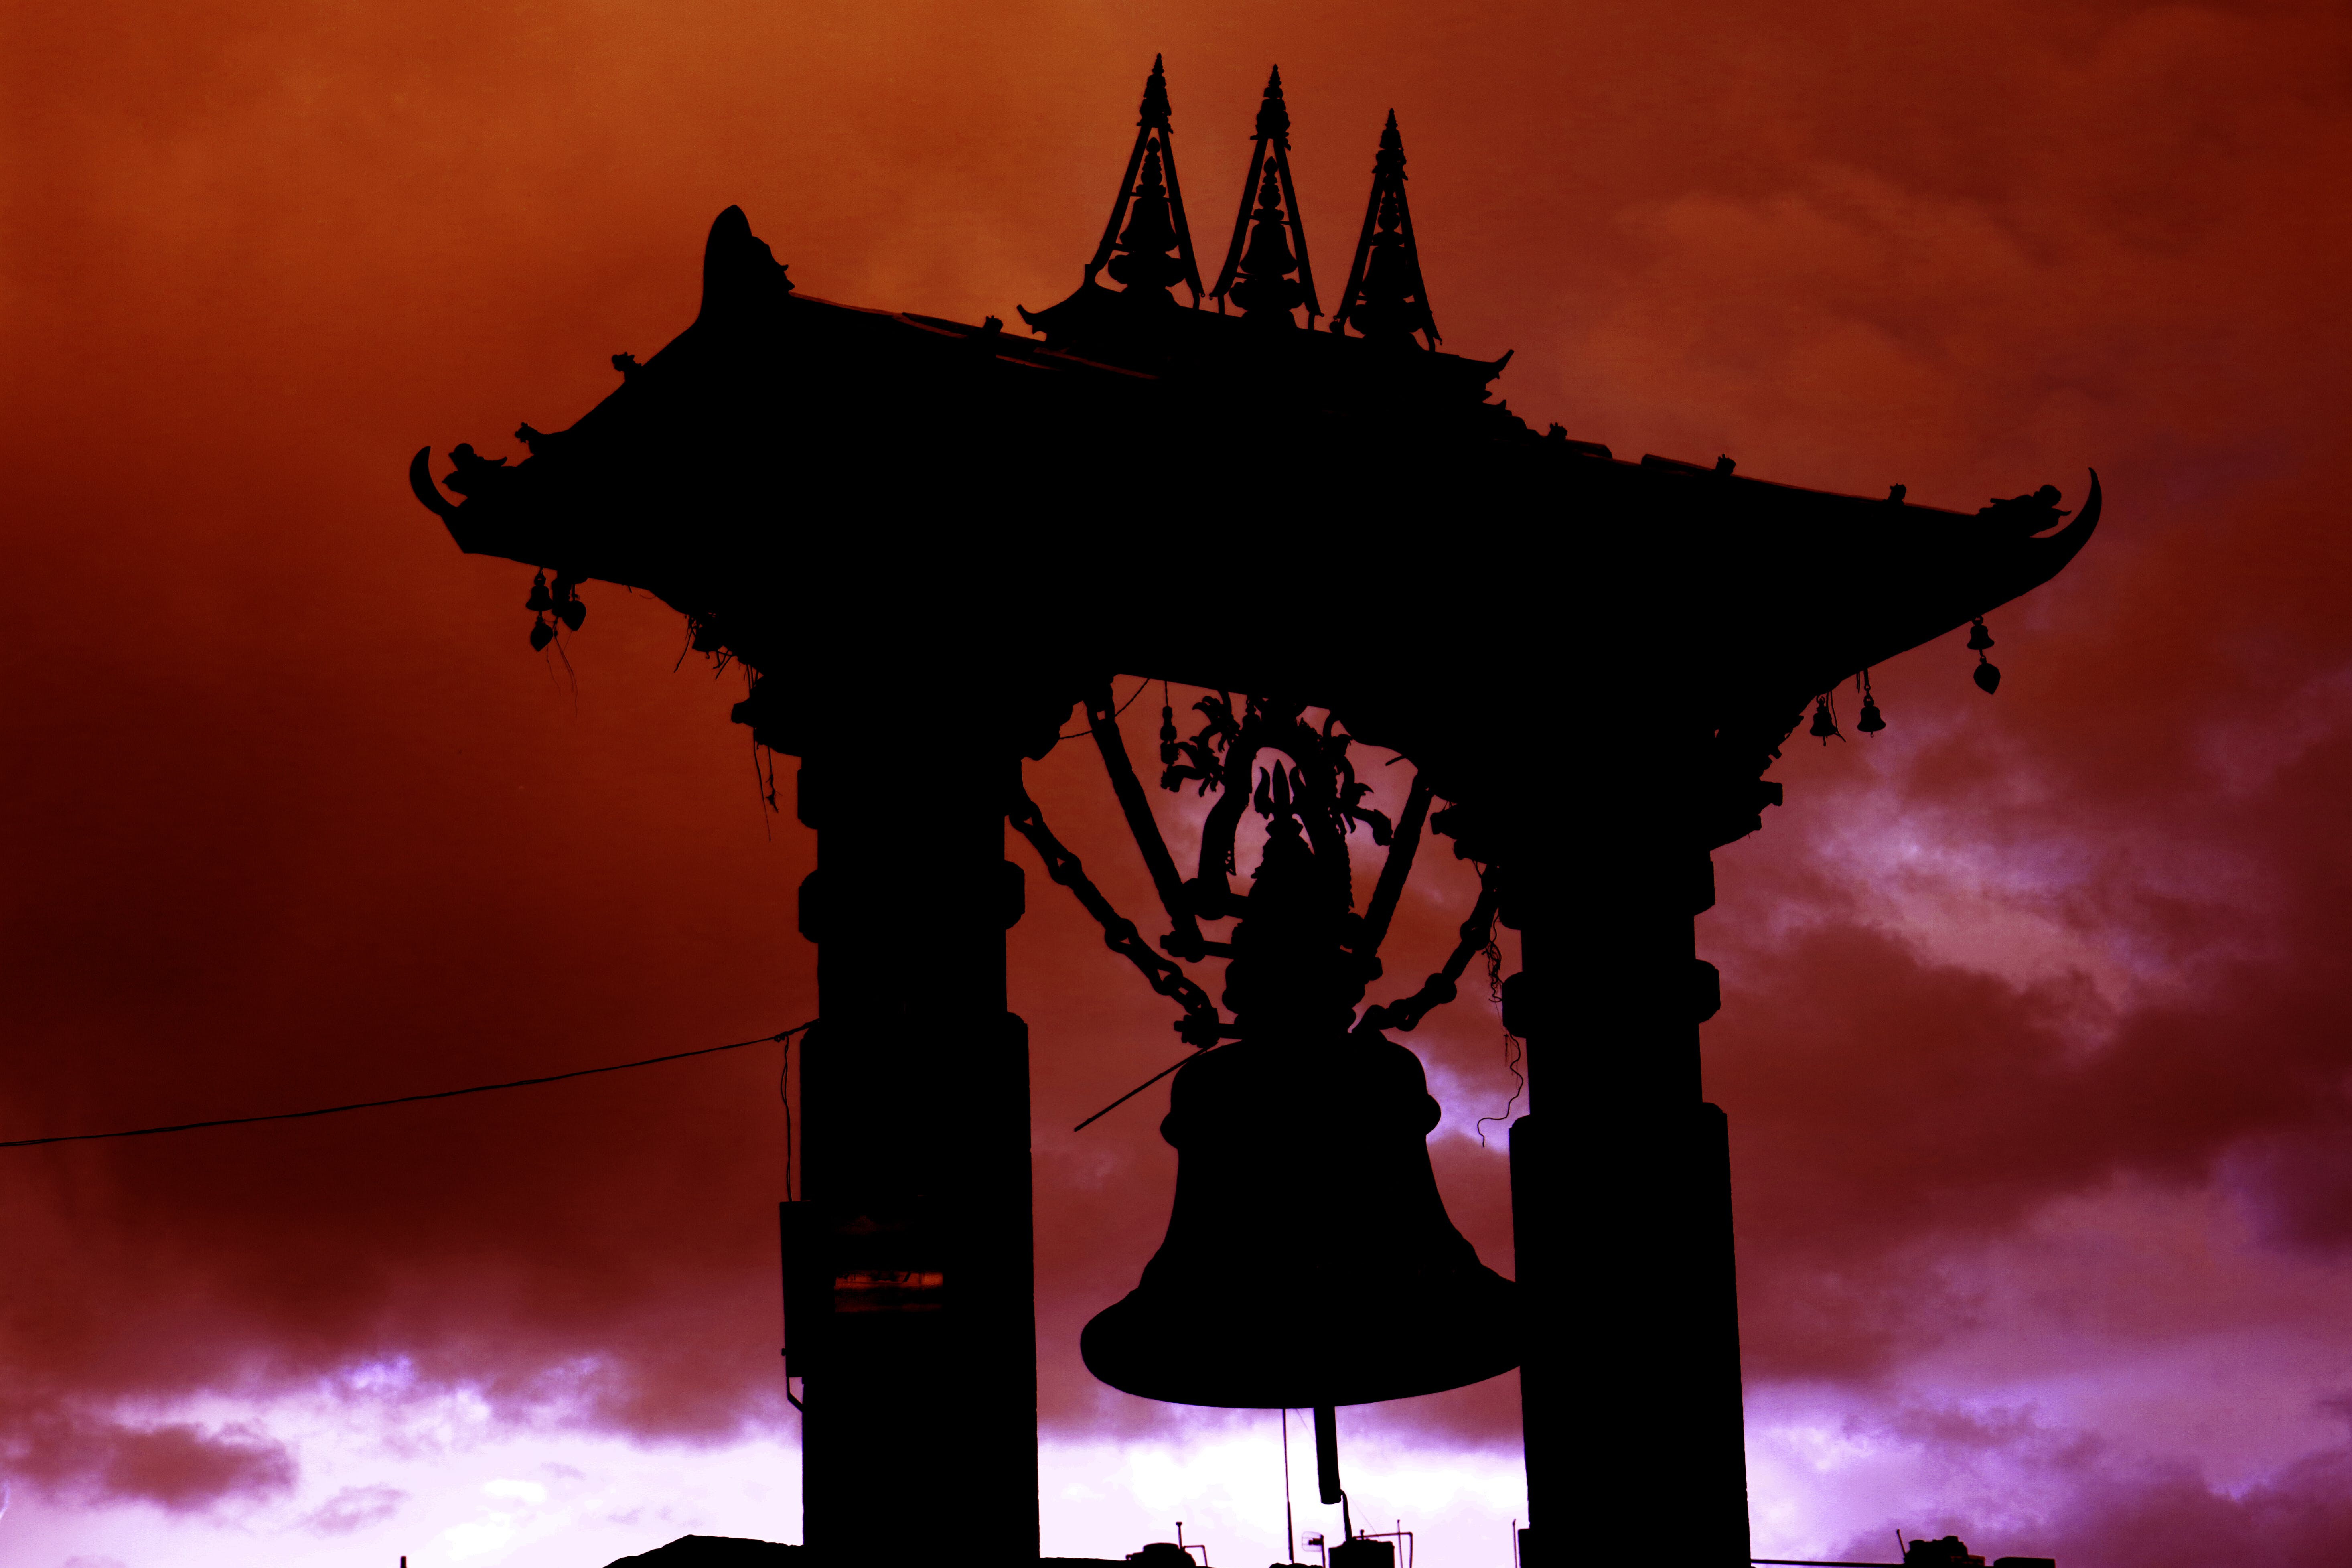 Free stock photo of krishna mandir bell